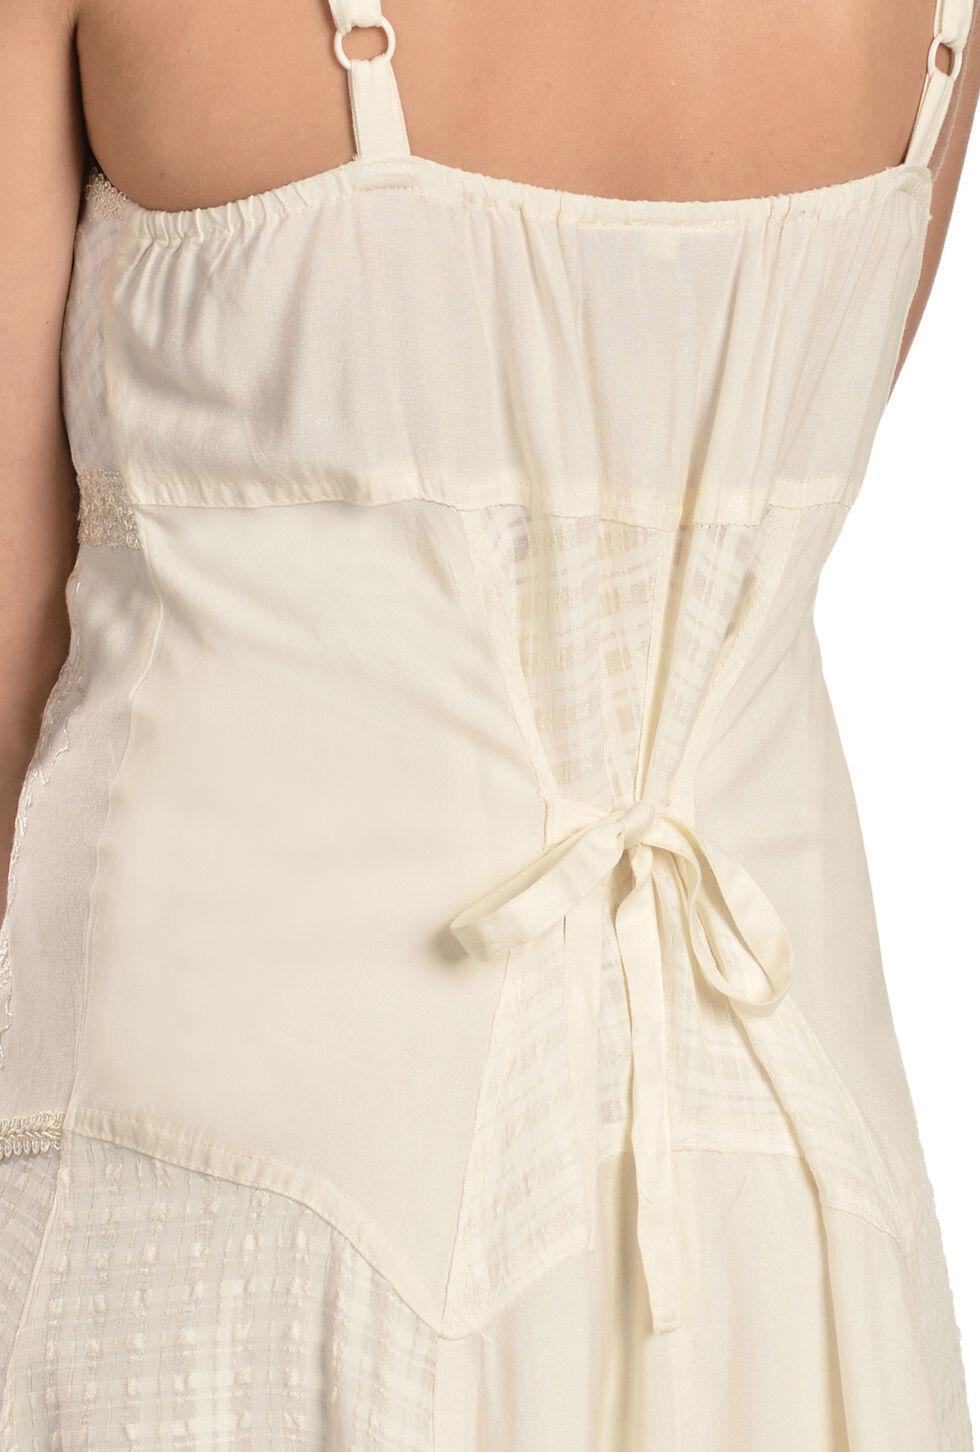 Scully Long Maxi Dress, Ivory, hi-res